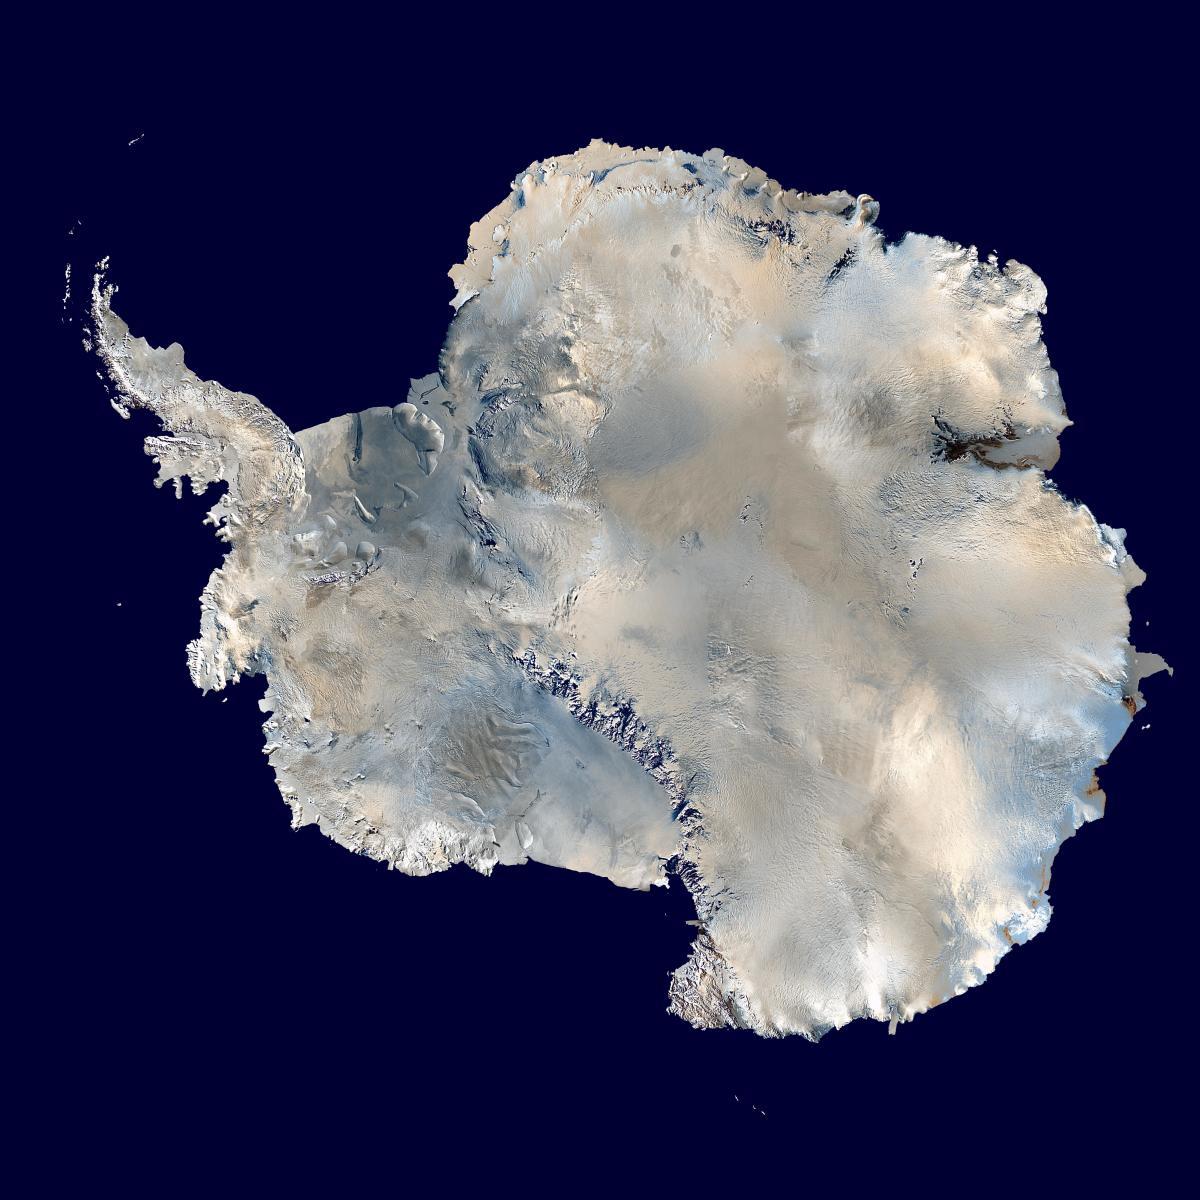 A satellite composite image of Antarctica. (Photo: Wikimedia Commons)